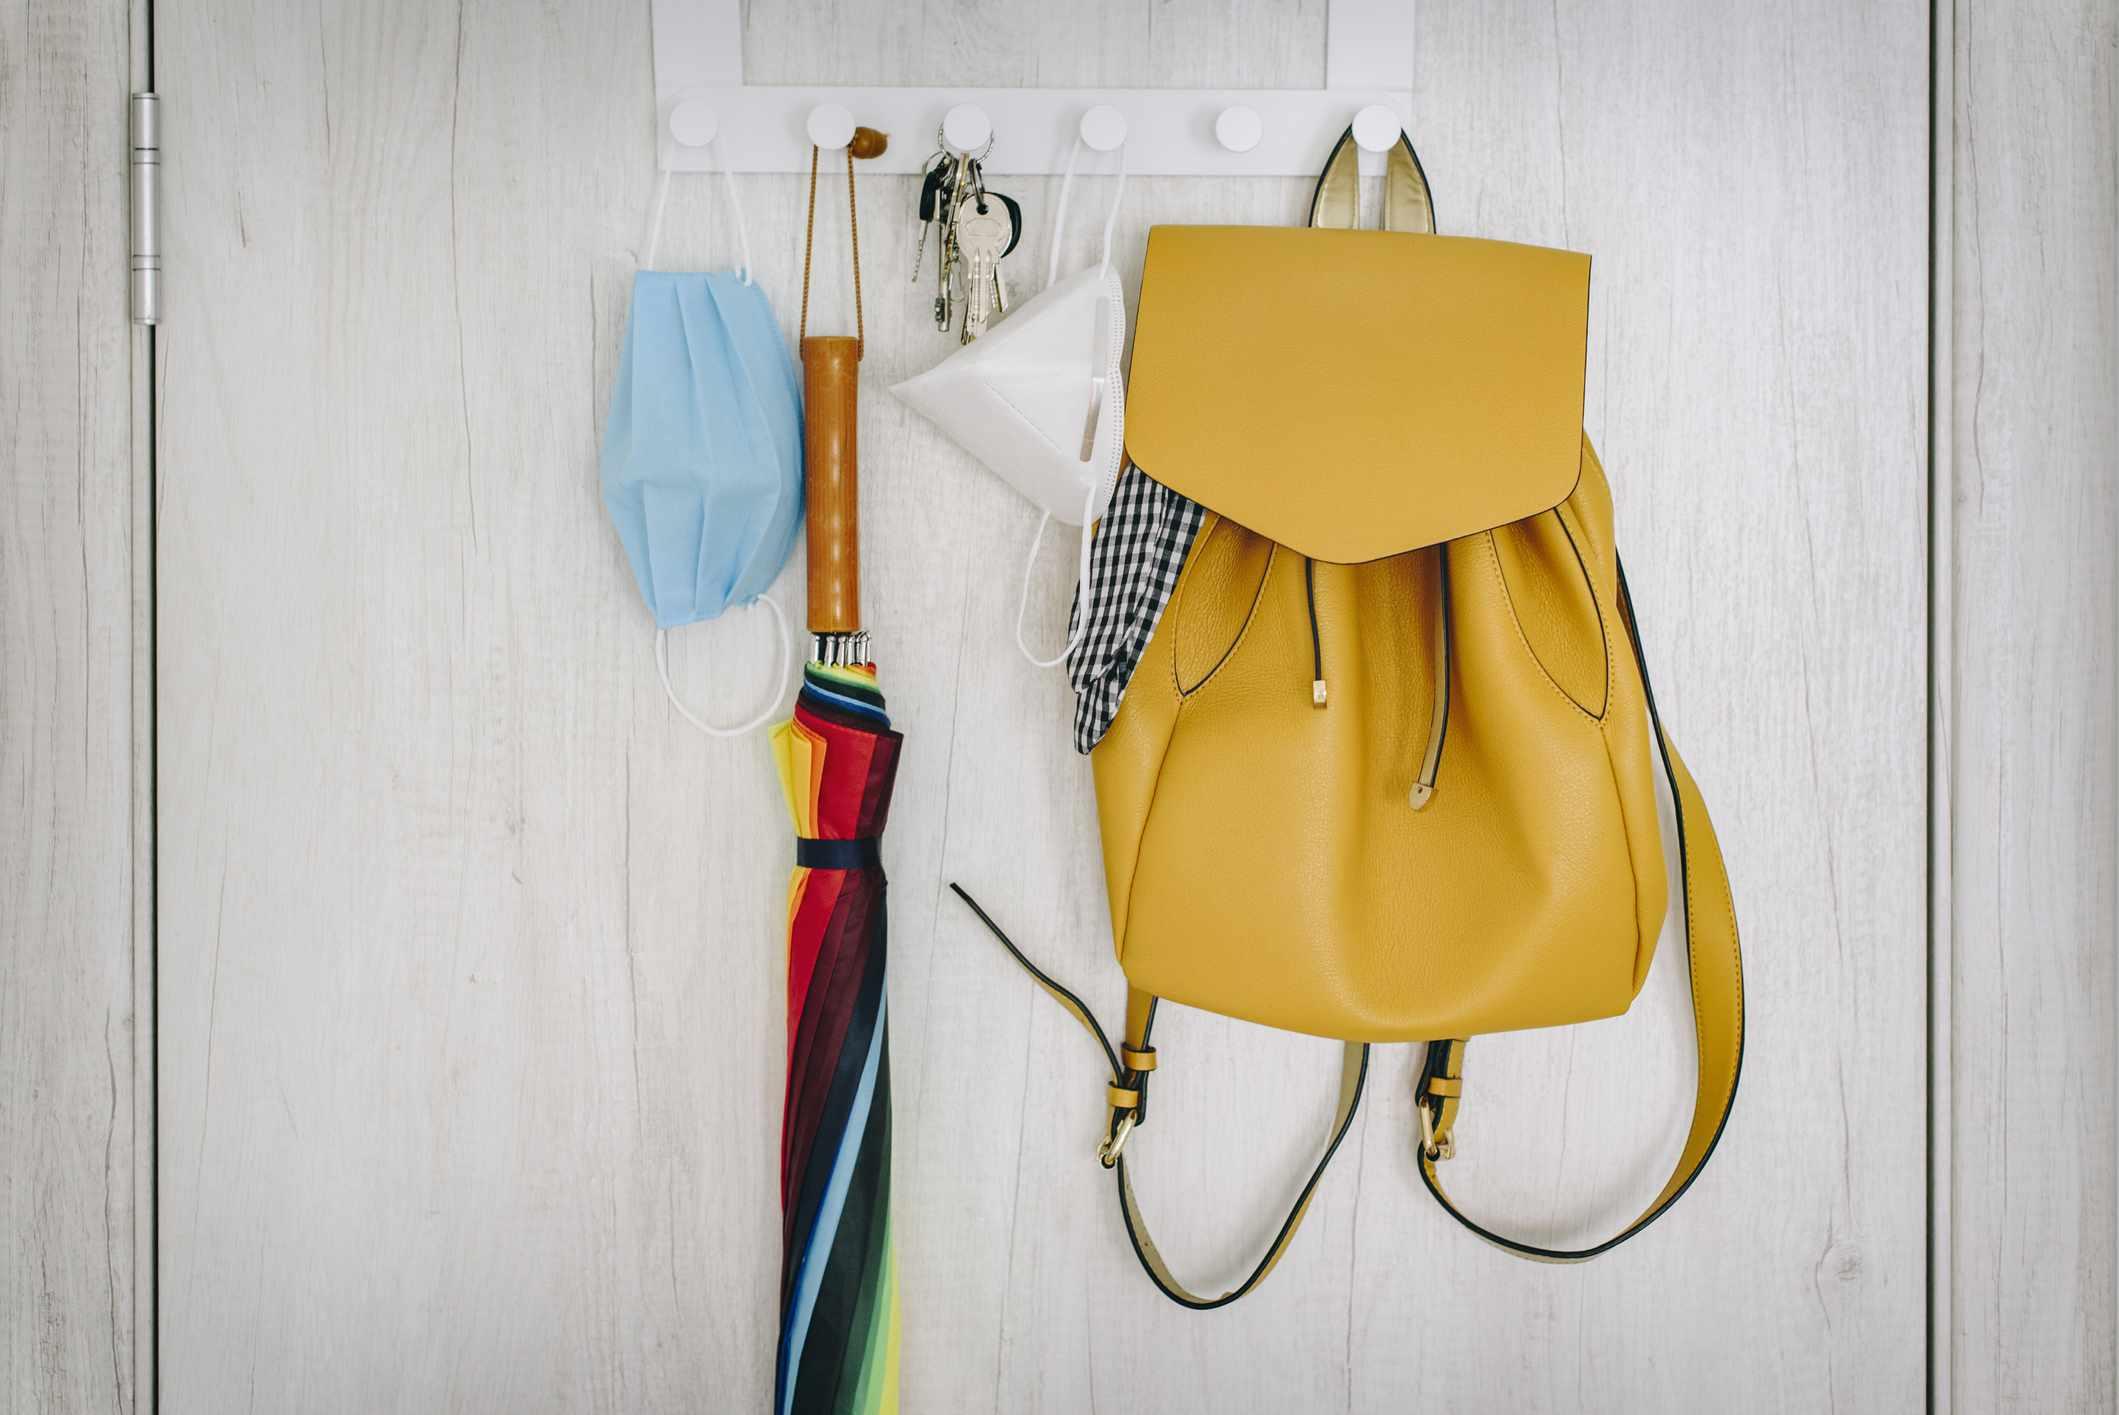 backpack, umbrella, and face masks on coat hooks